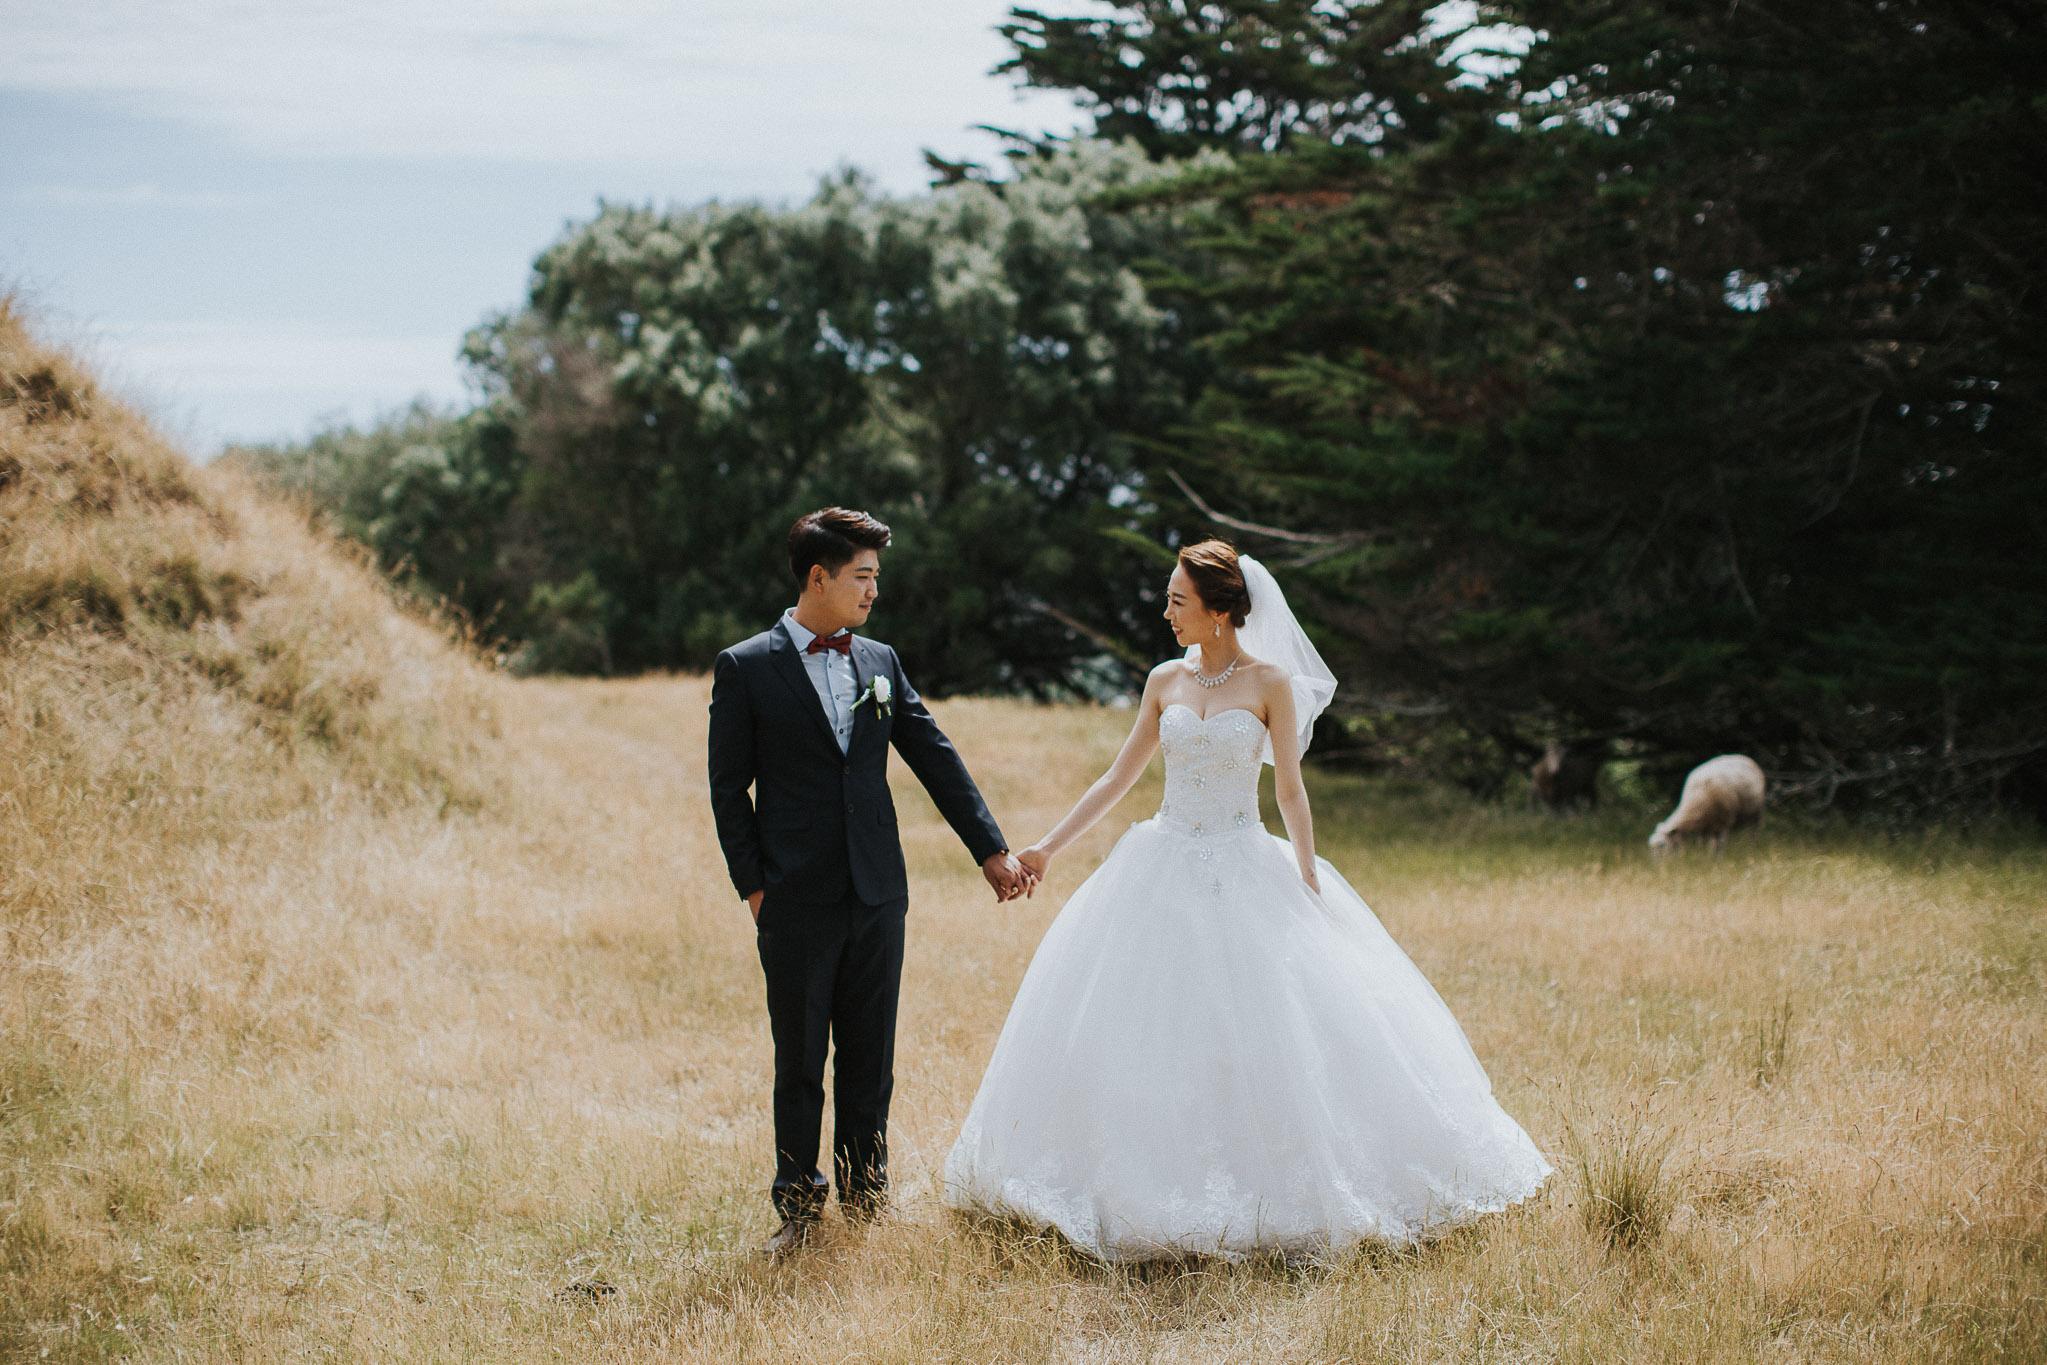 Mantells Auckland wedding photographer - Eri-Jun-41.jpg